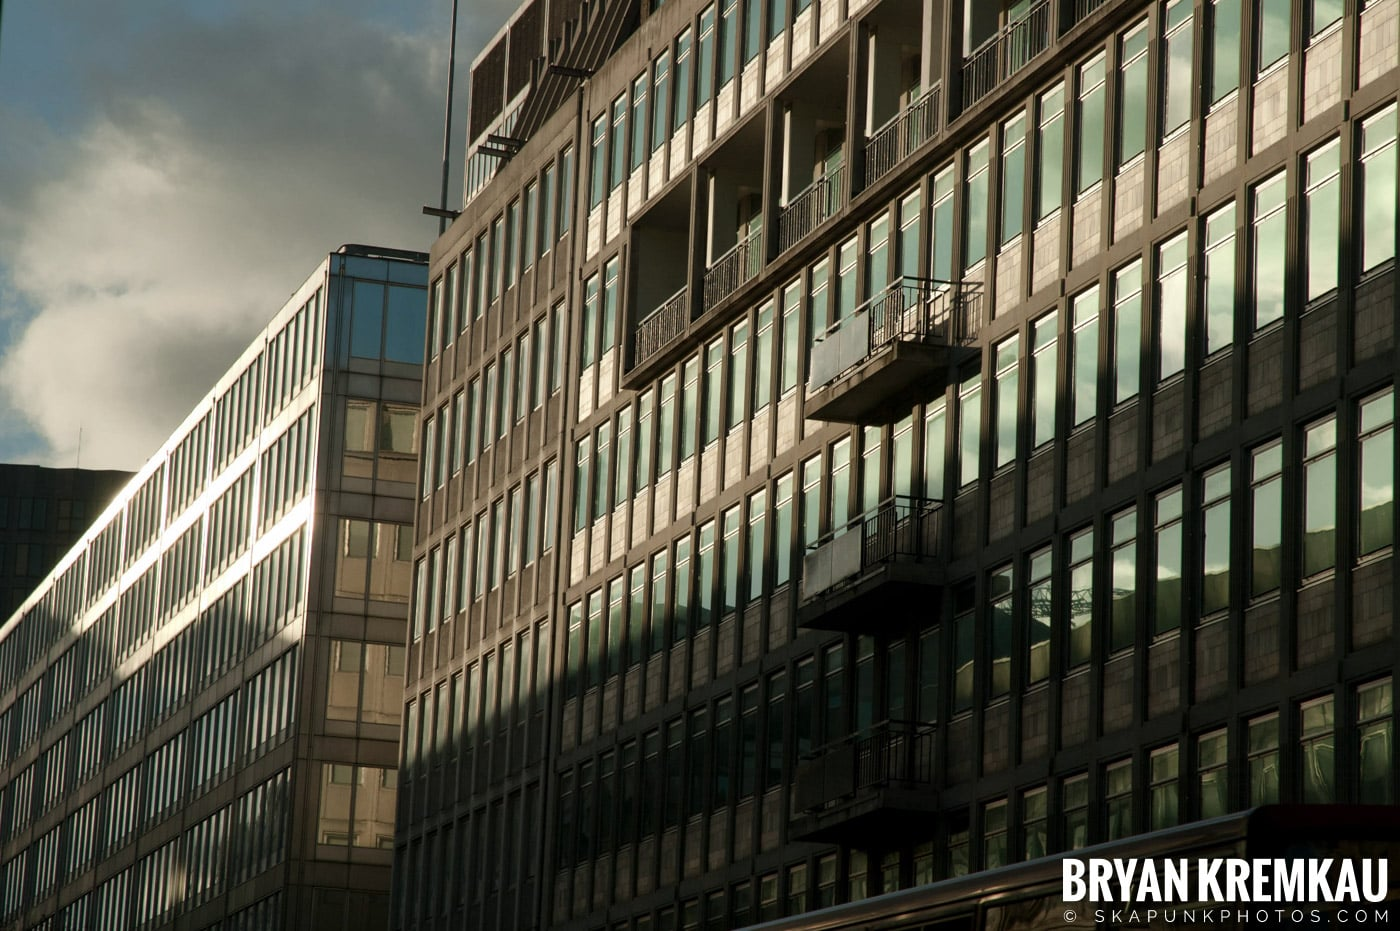 London, England - Day 2 - 12.9.06 (2)